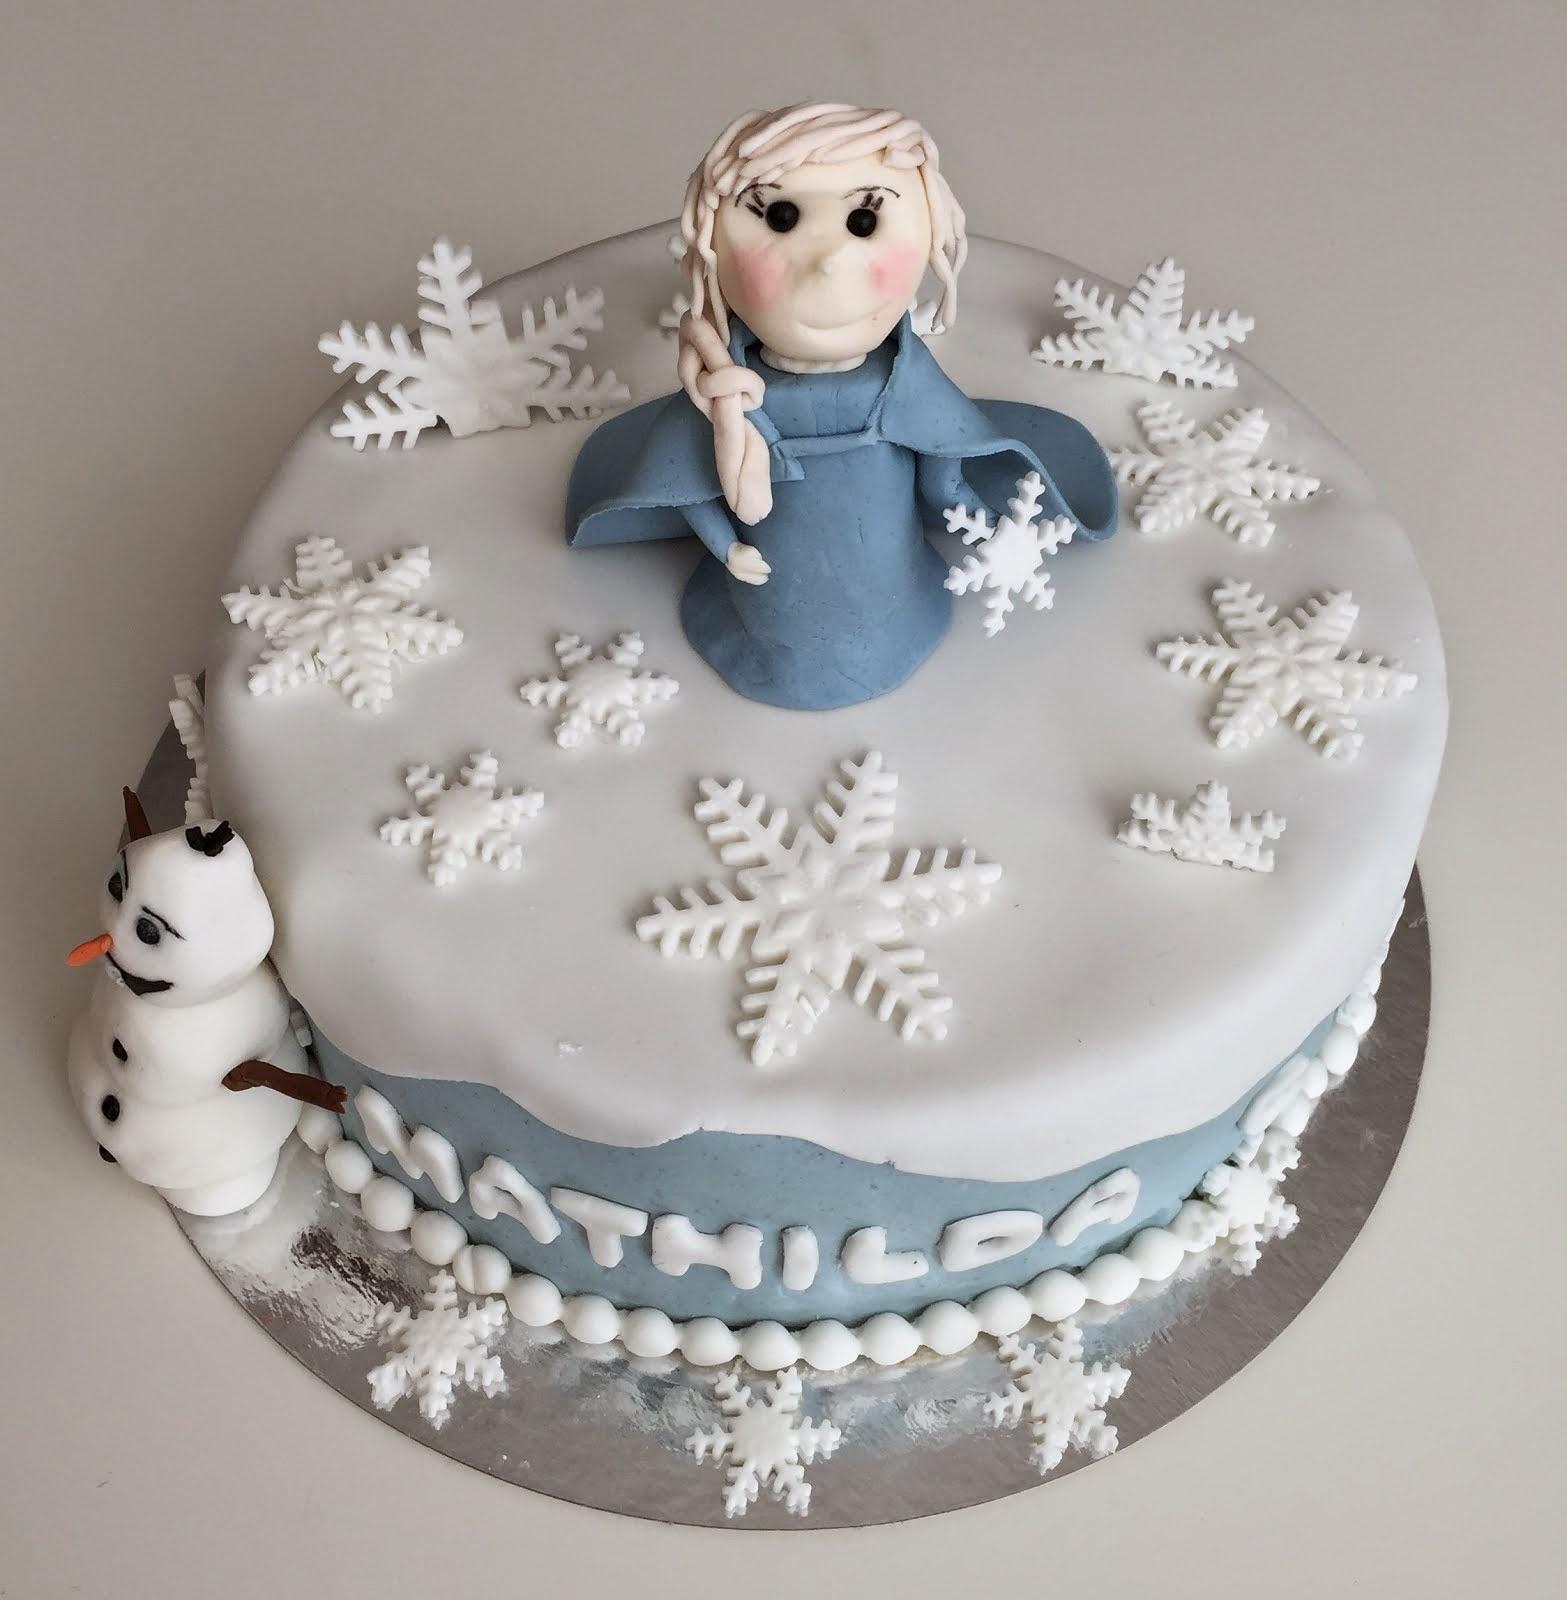 Frosttårta / Frozencake